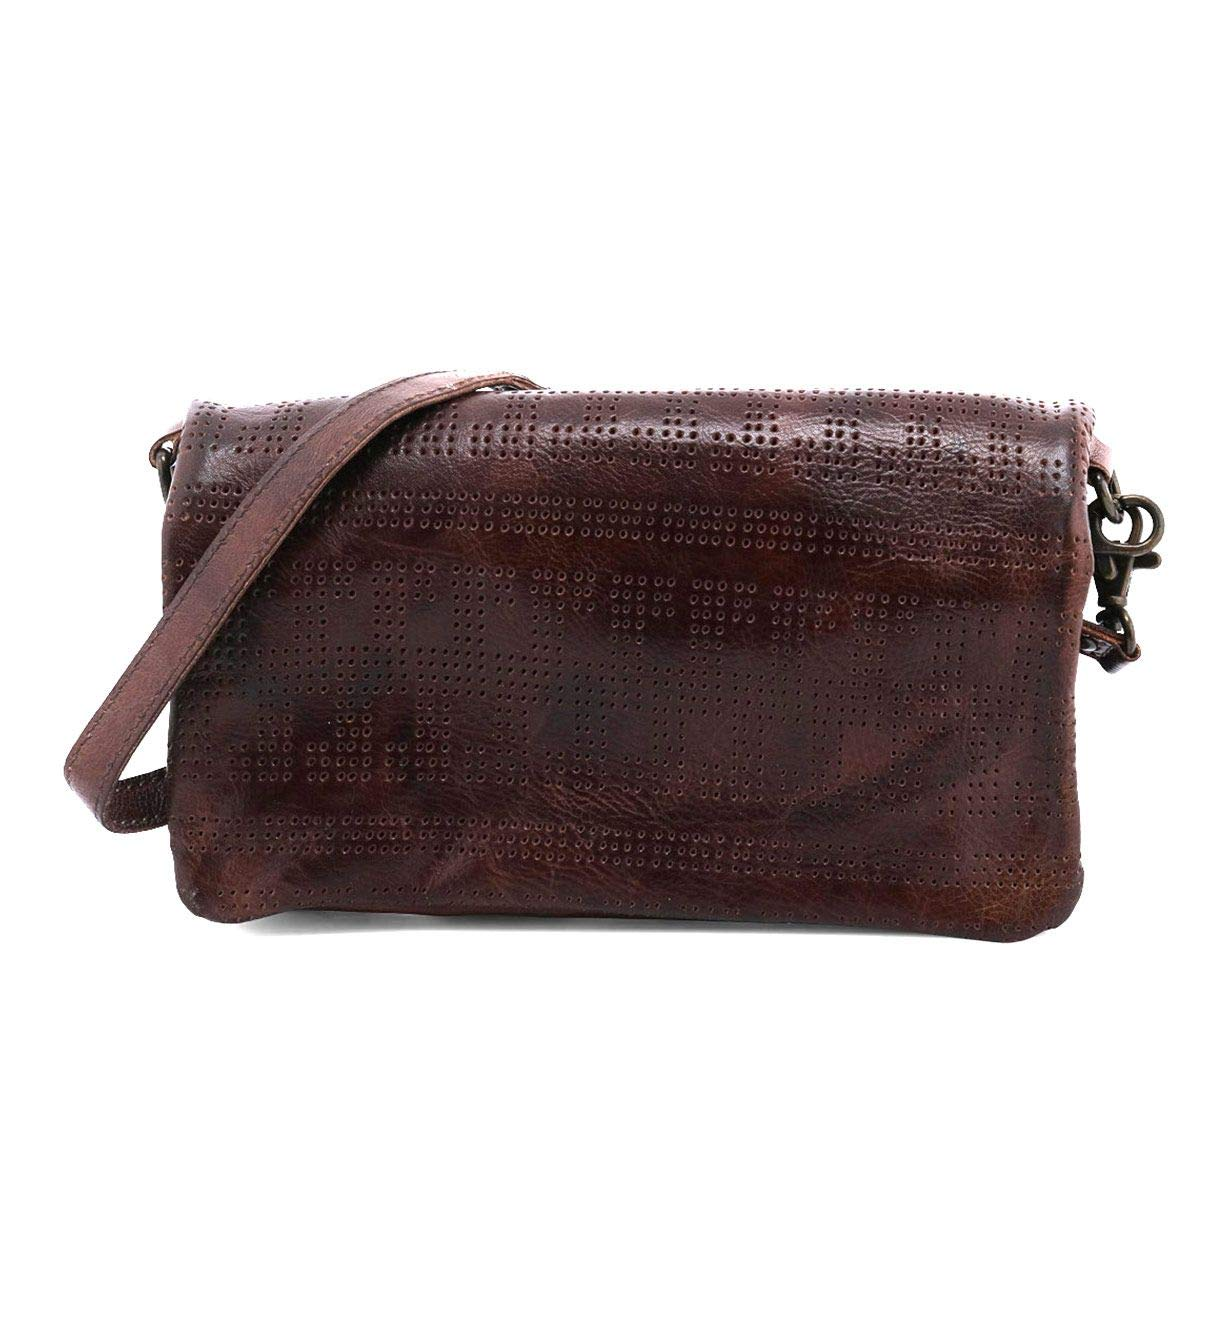 Bed|Stu Bayshore Leather Cross-body Bag (Teak Rustic)